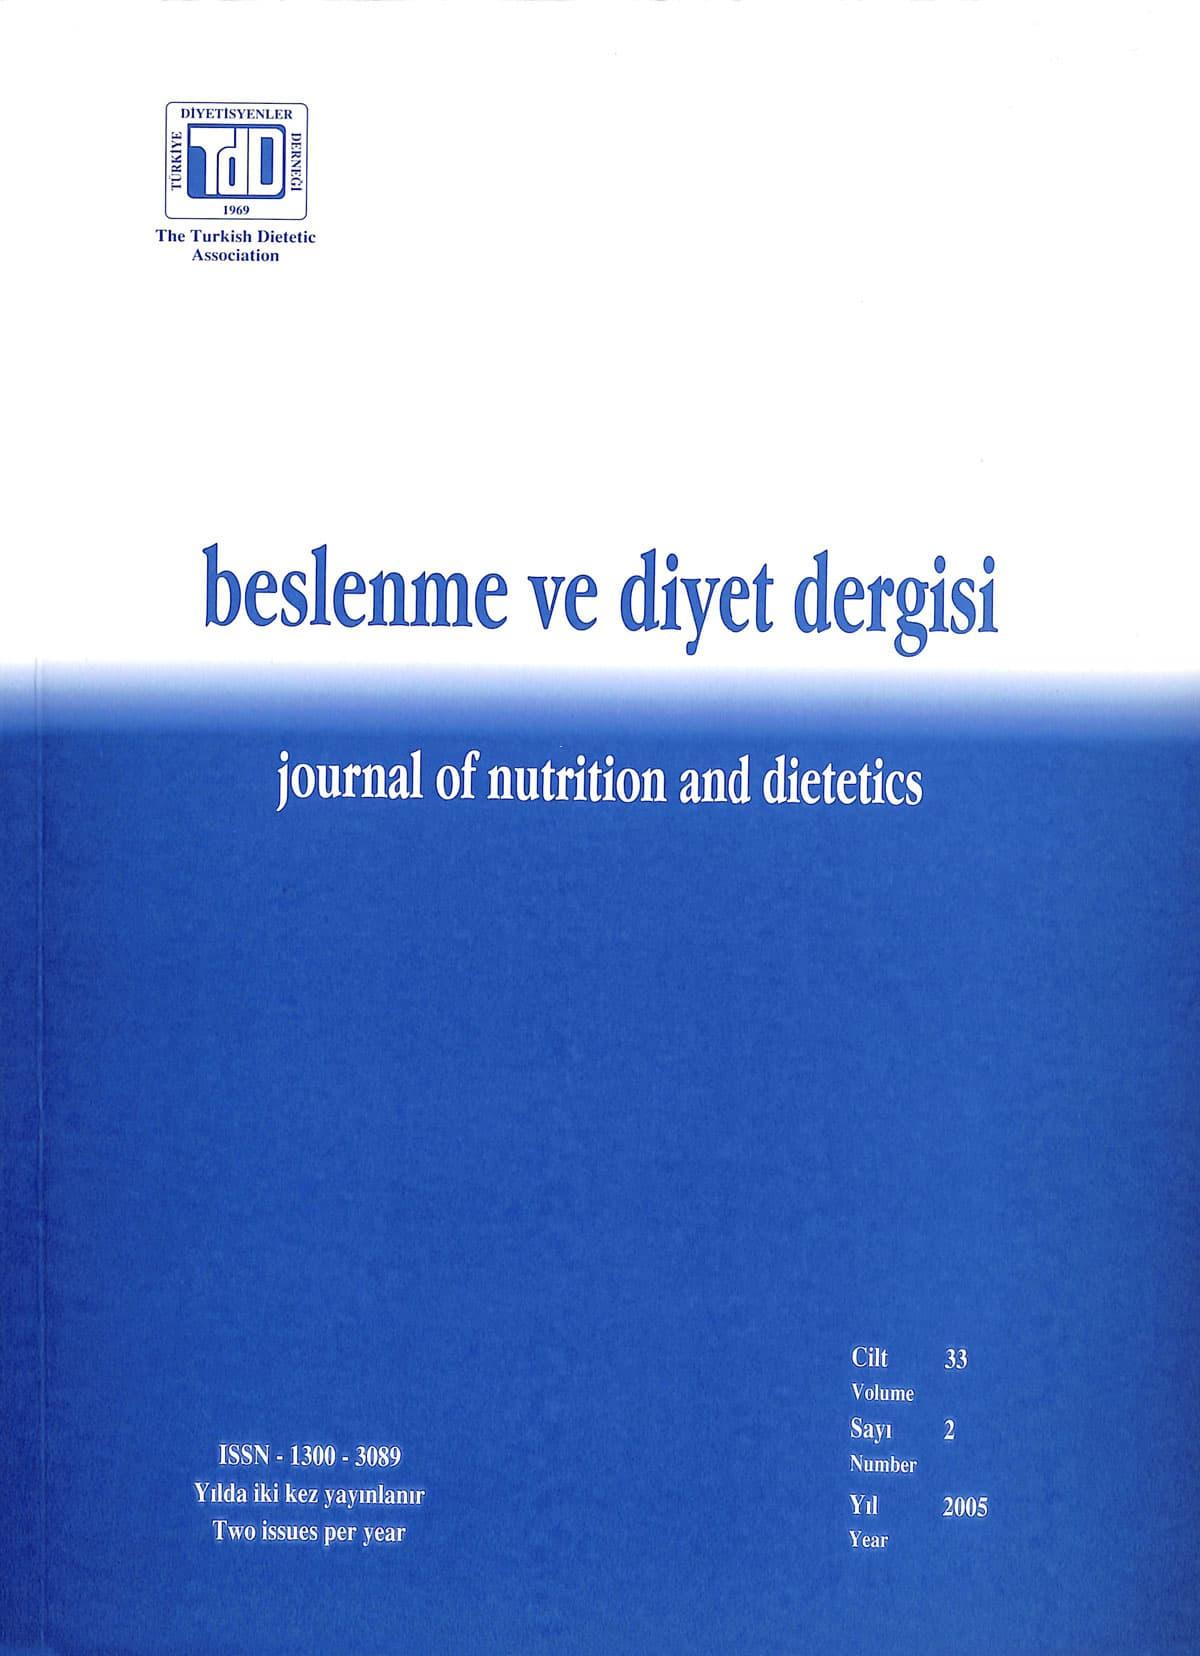 Cilt 33 Sayı 2 (2005)